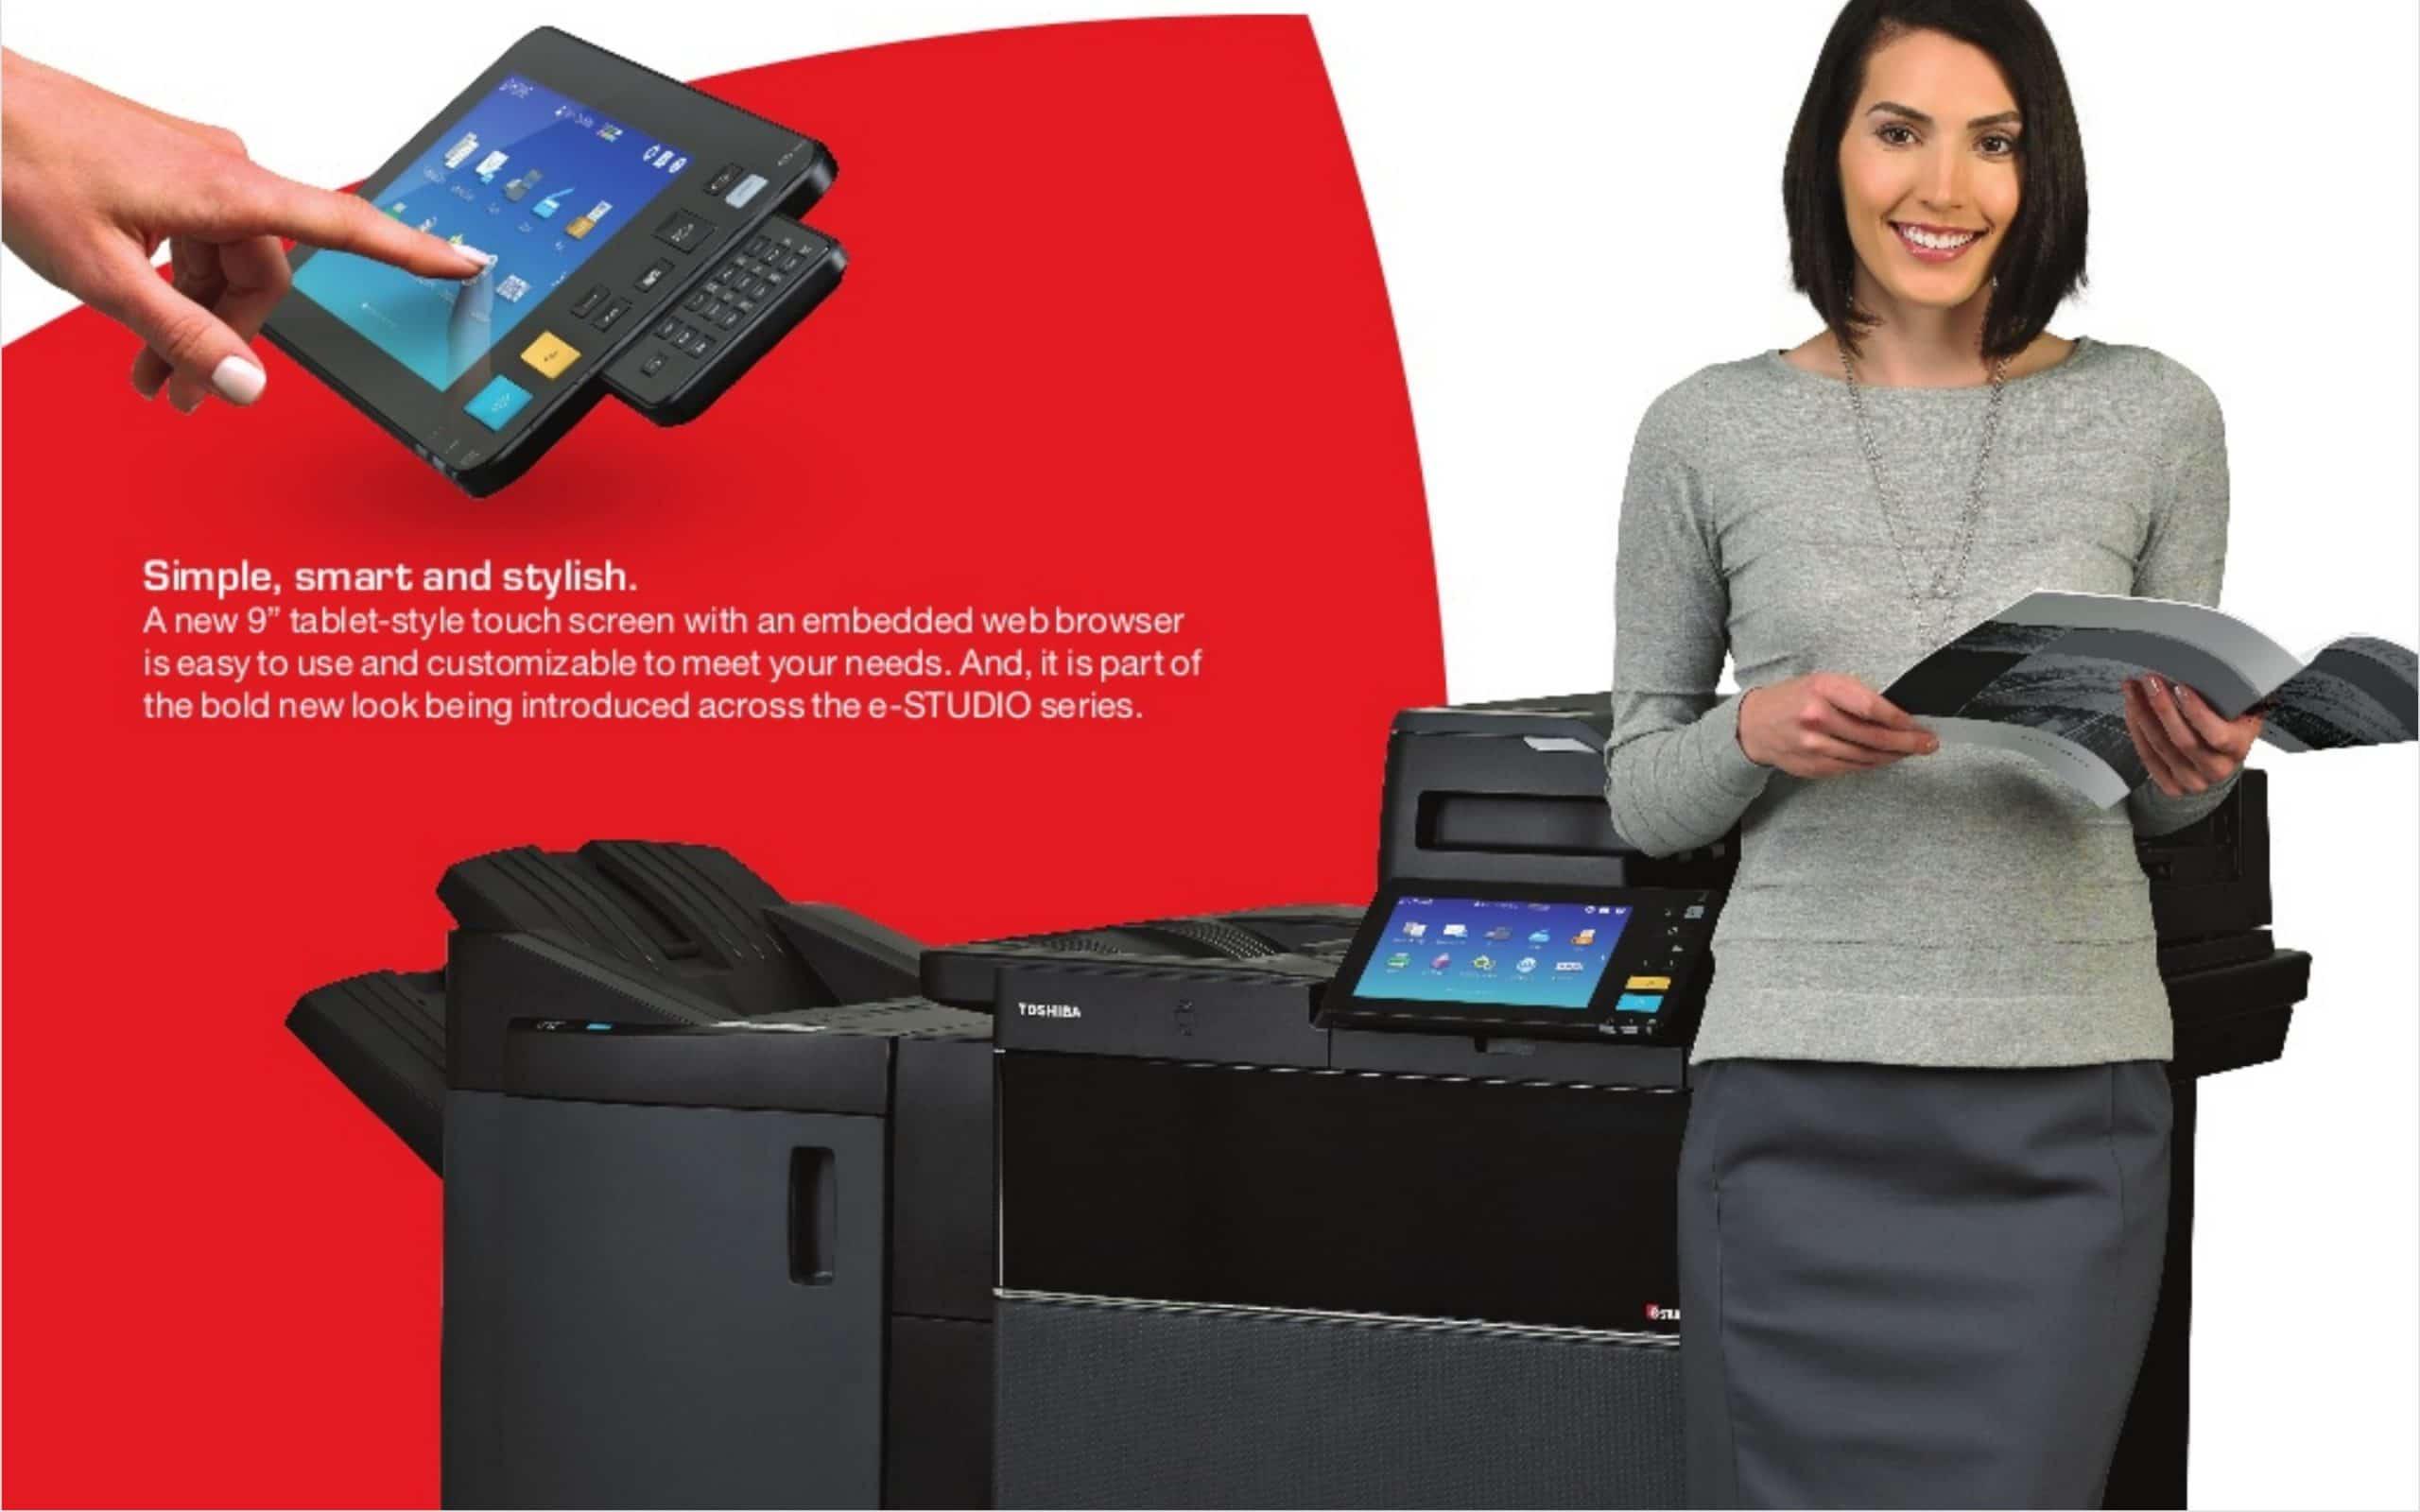 Giới thiệu máy photocopy siêu tốc Toshiba 6508A